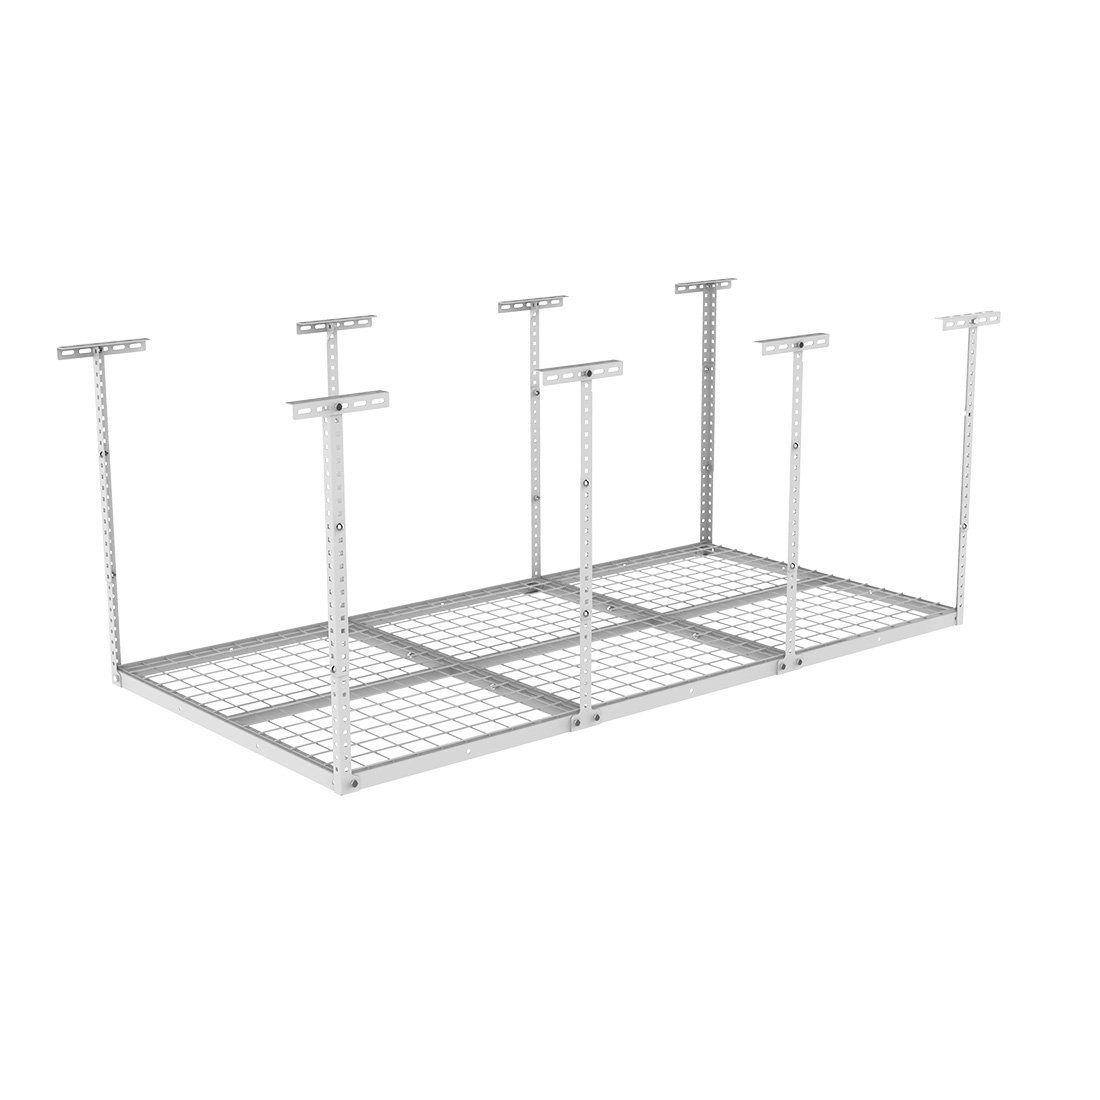 "Fleximounts 72"" Length x 36"" Width x 40"" Height Adjustable Ceiling Storage Rack 3x6 Overhead Garage white"